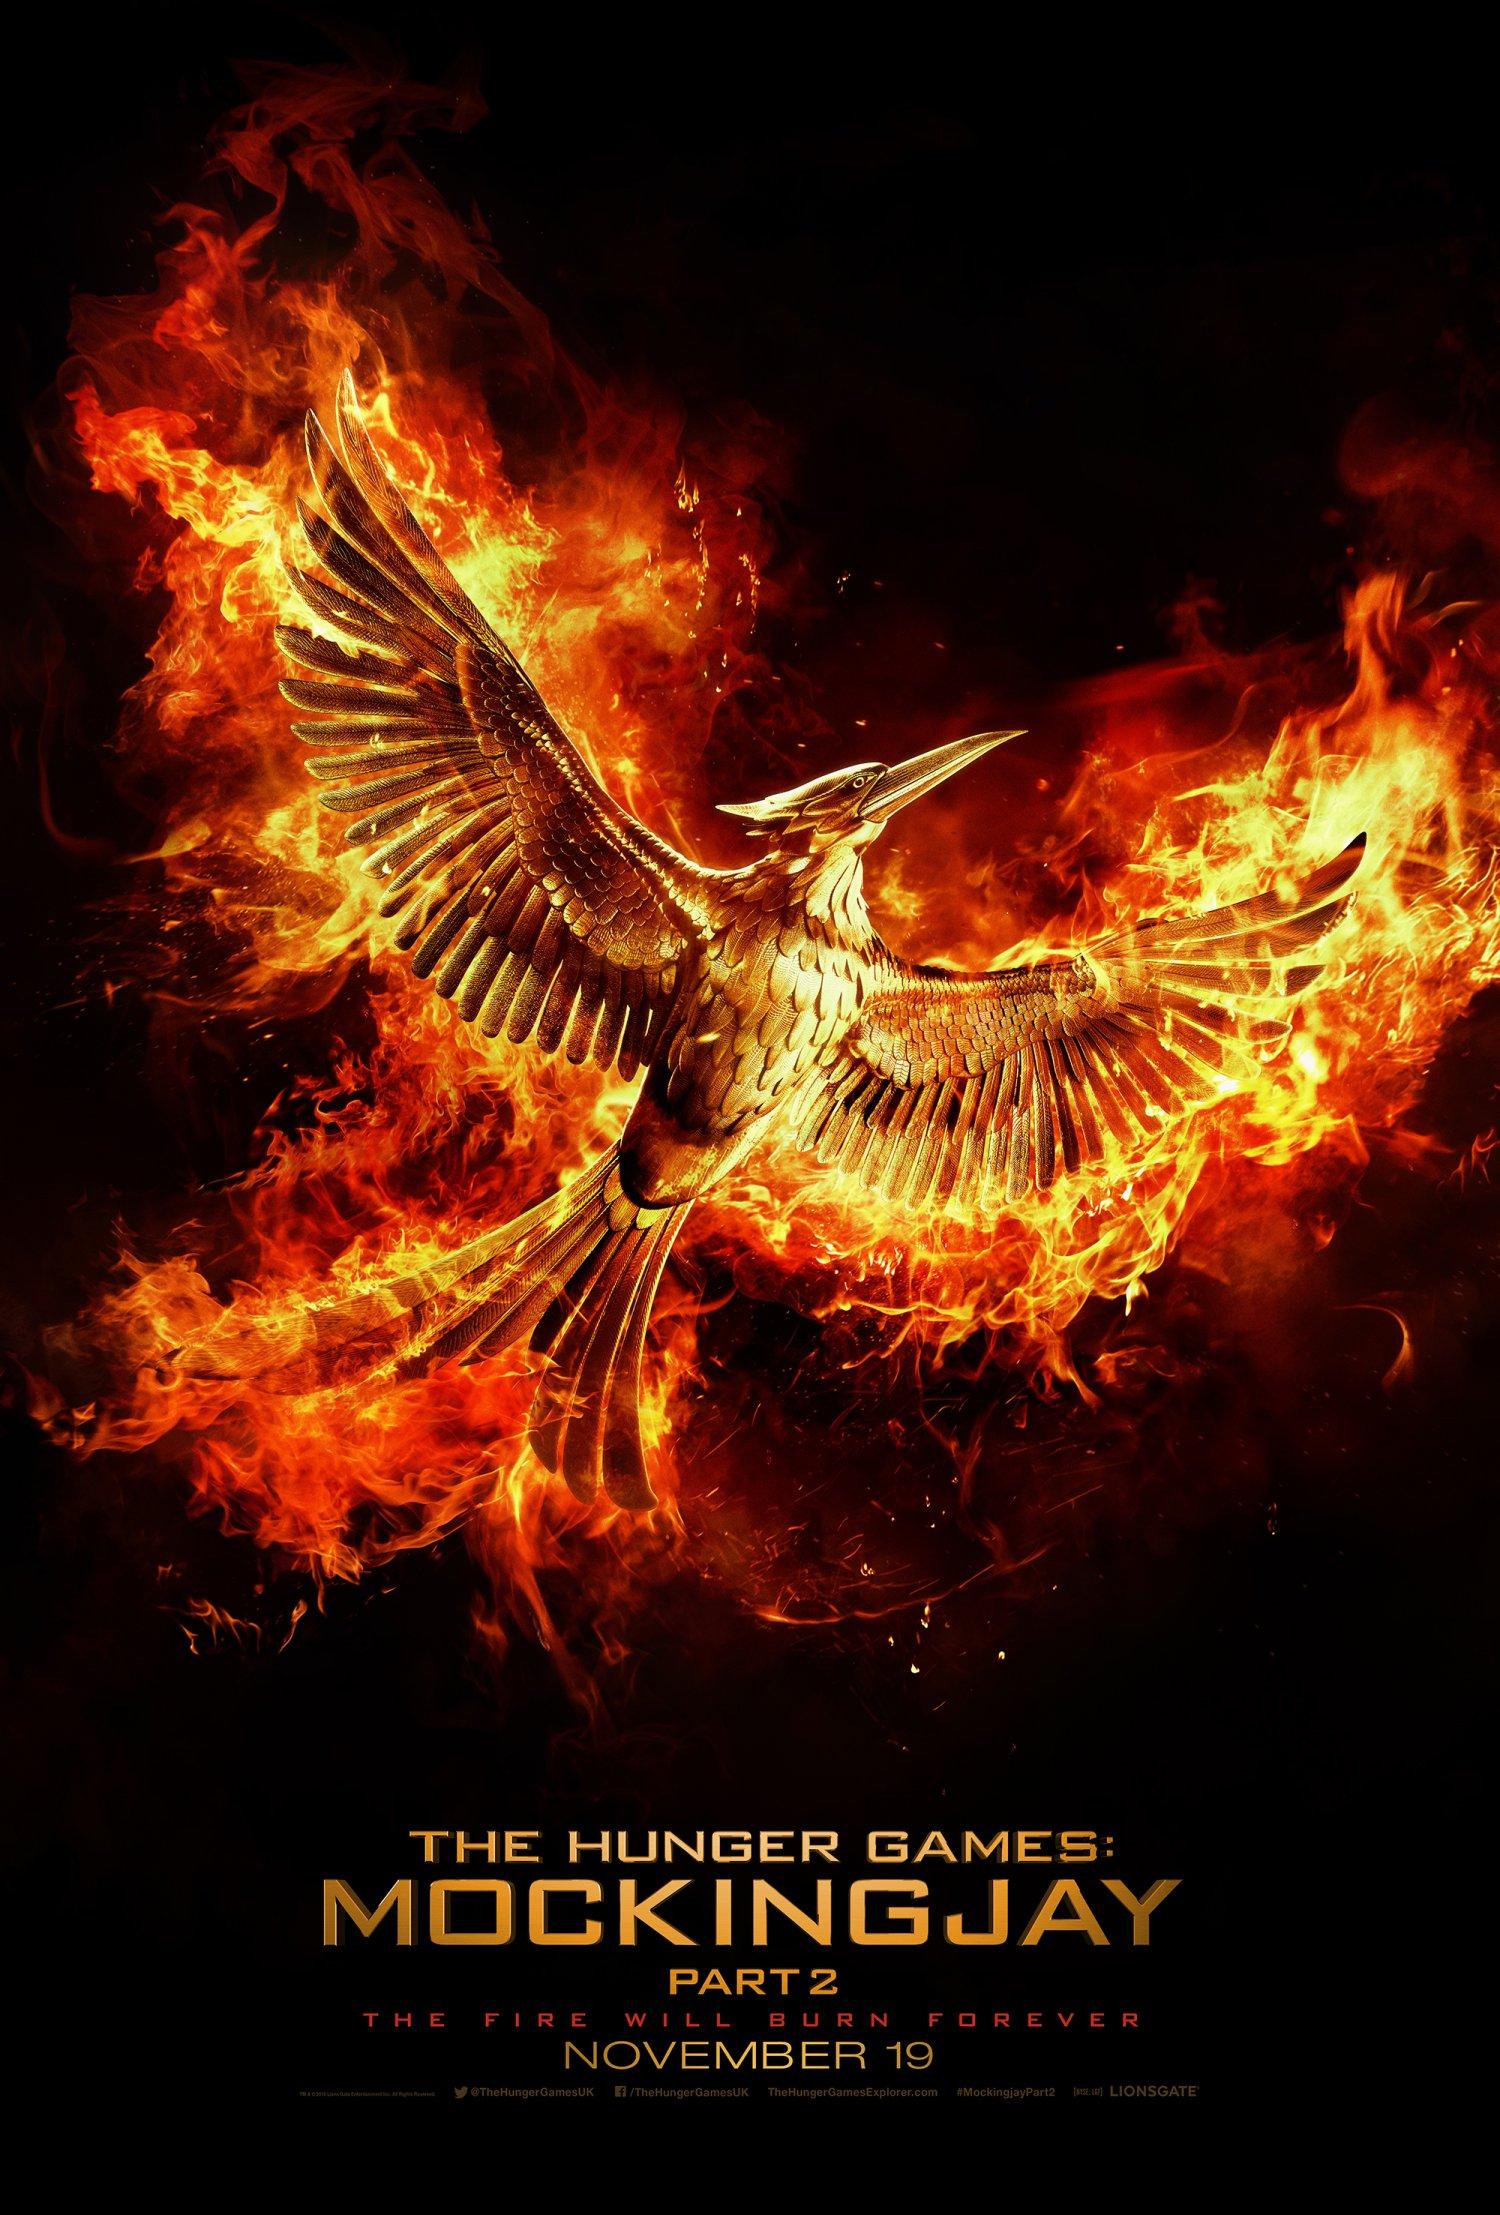 Katniss is back with Mockingjay part 2